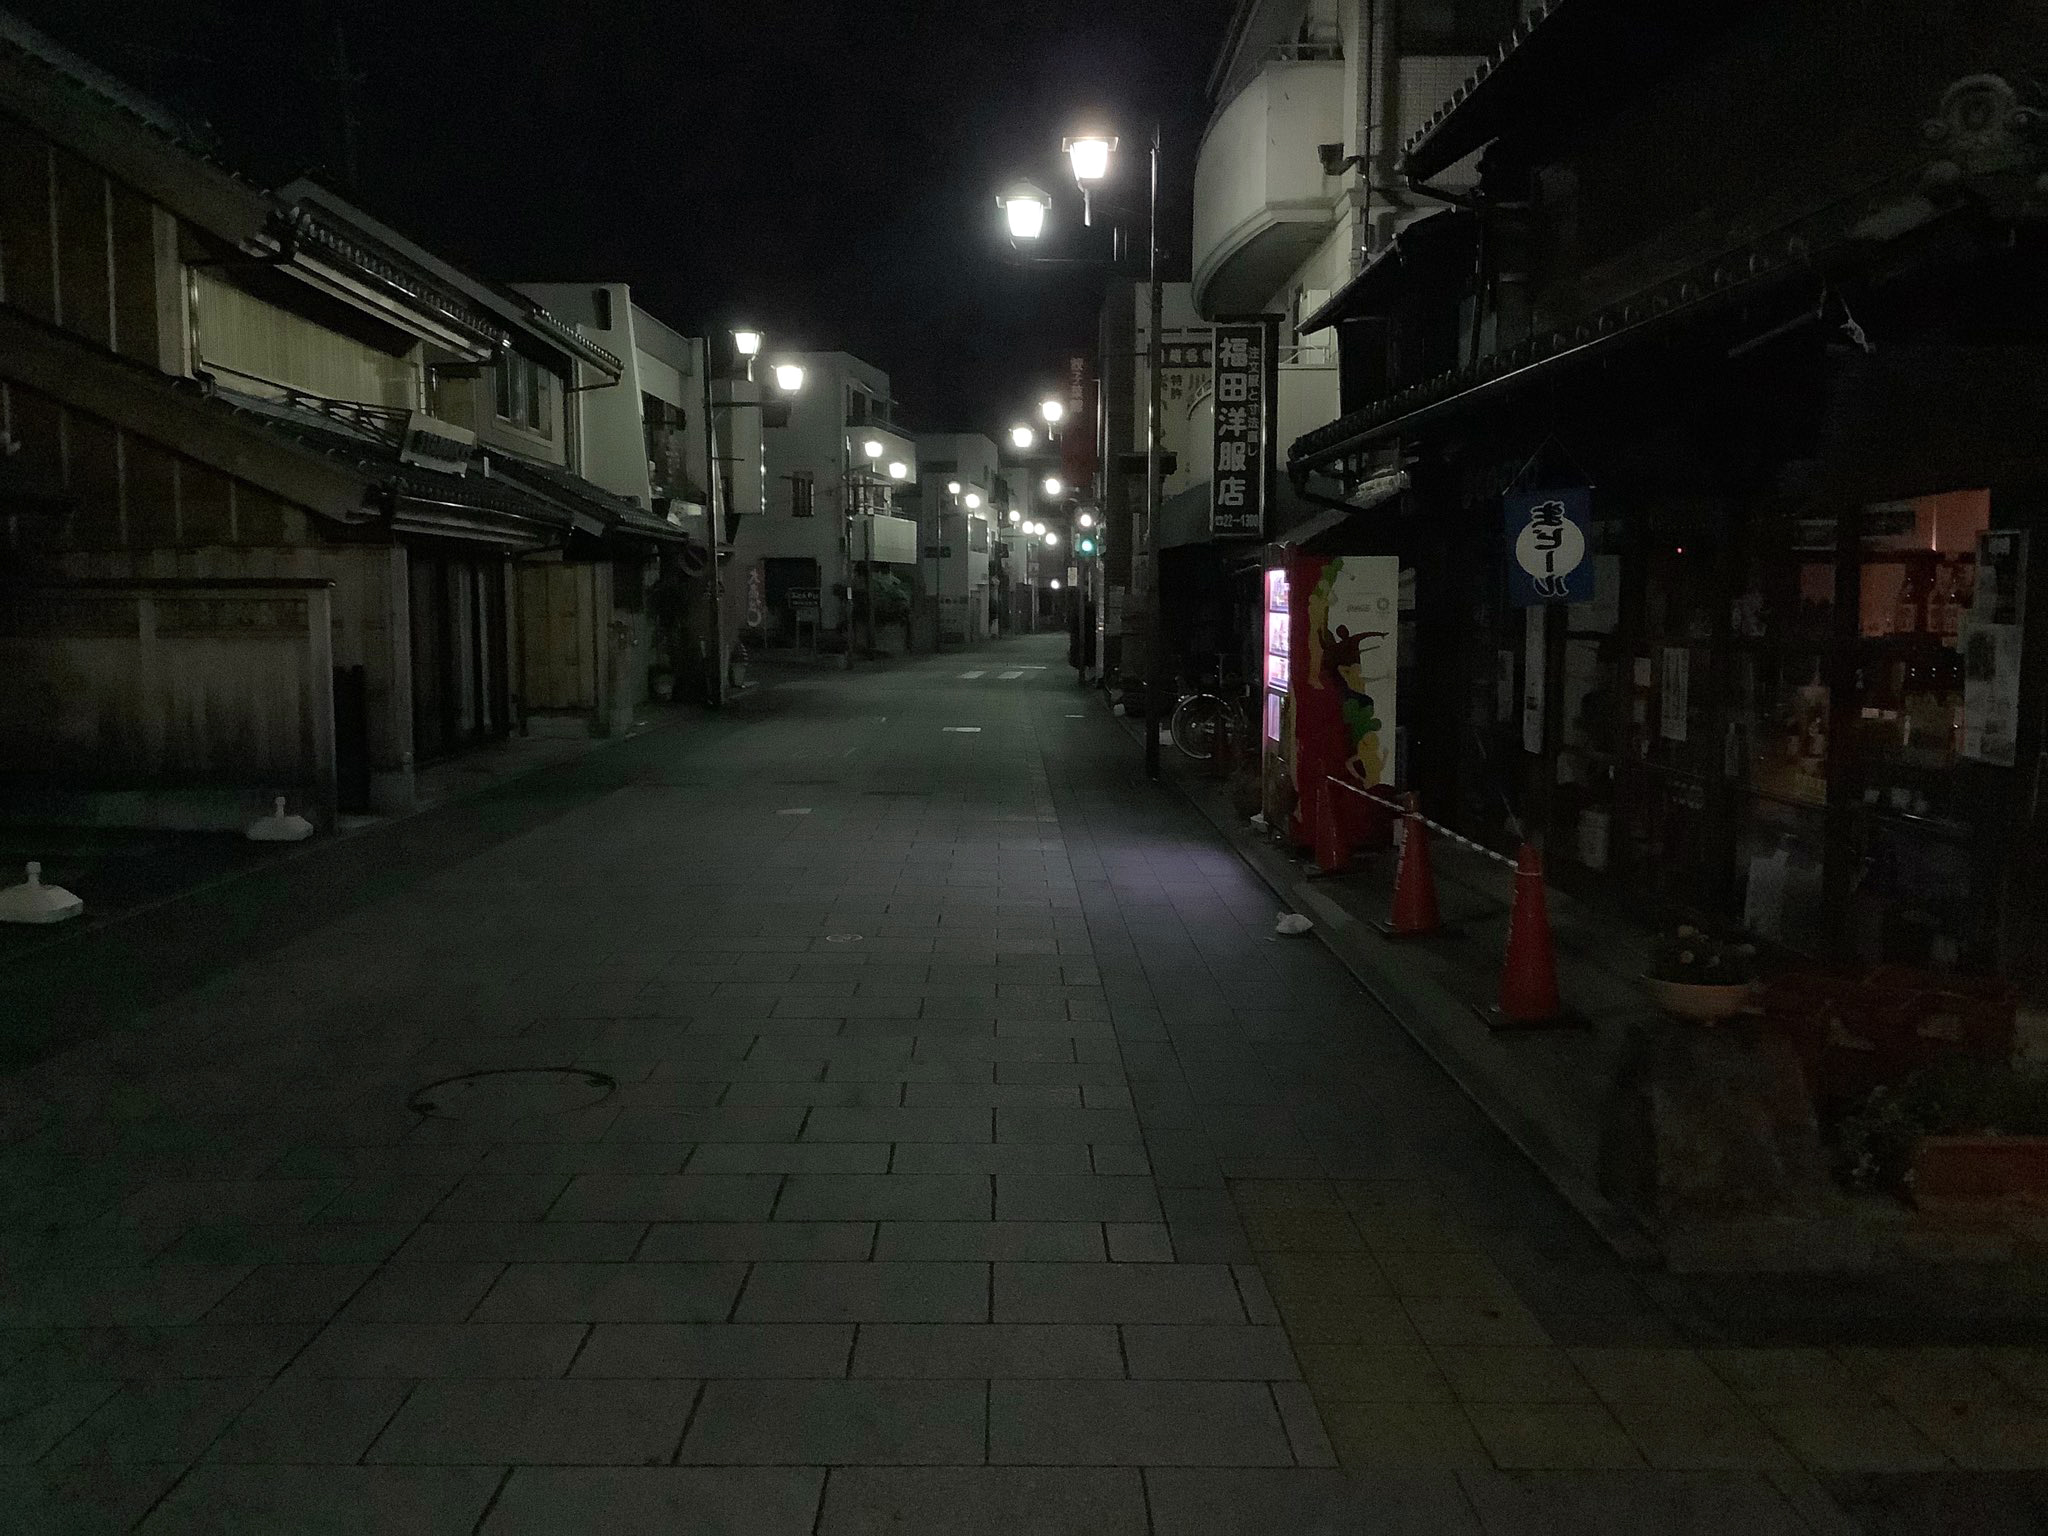 Ichiban-gai Street in the night